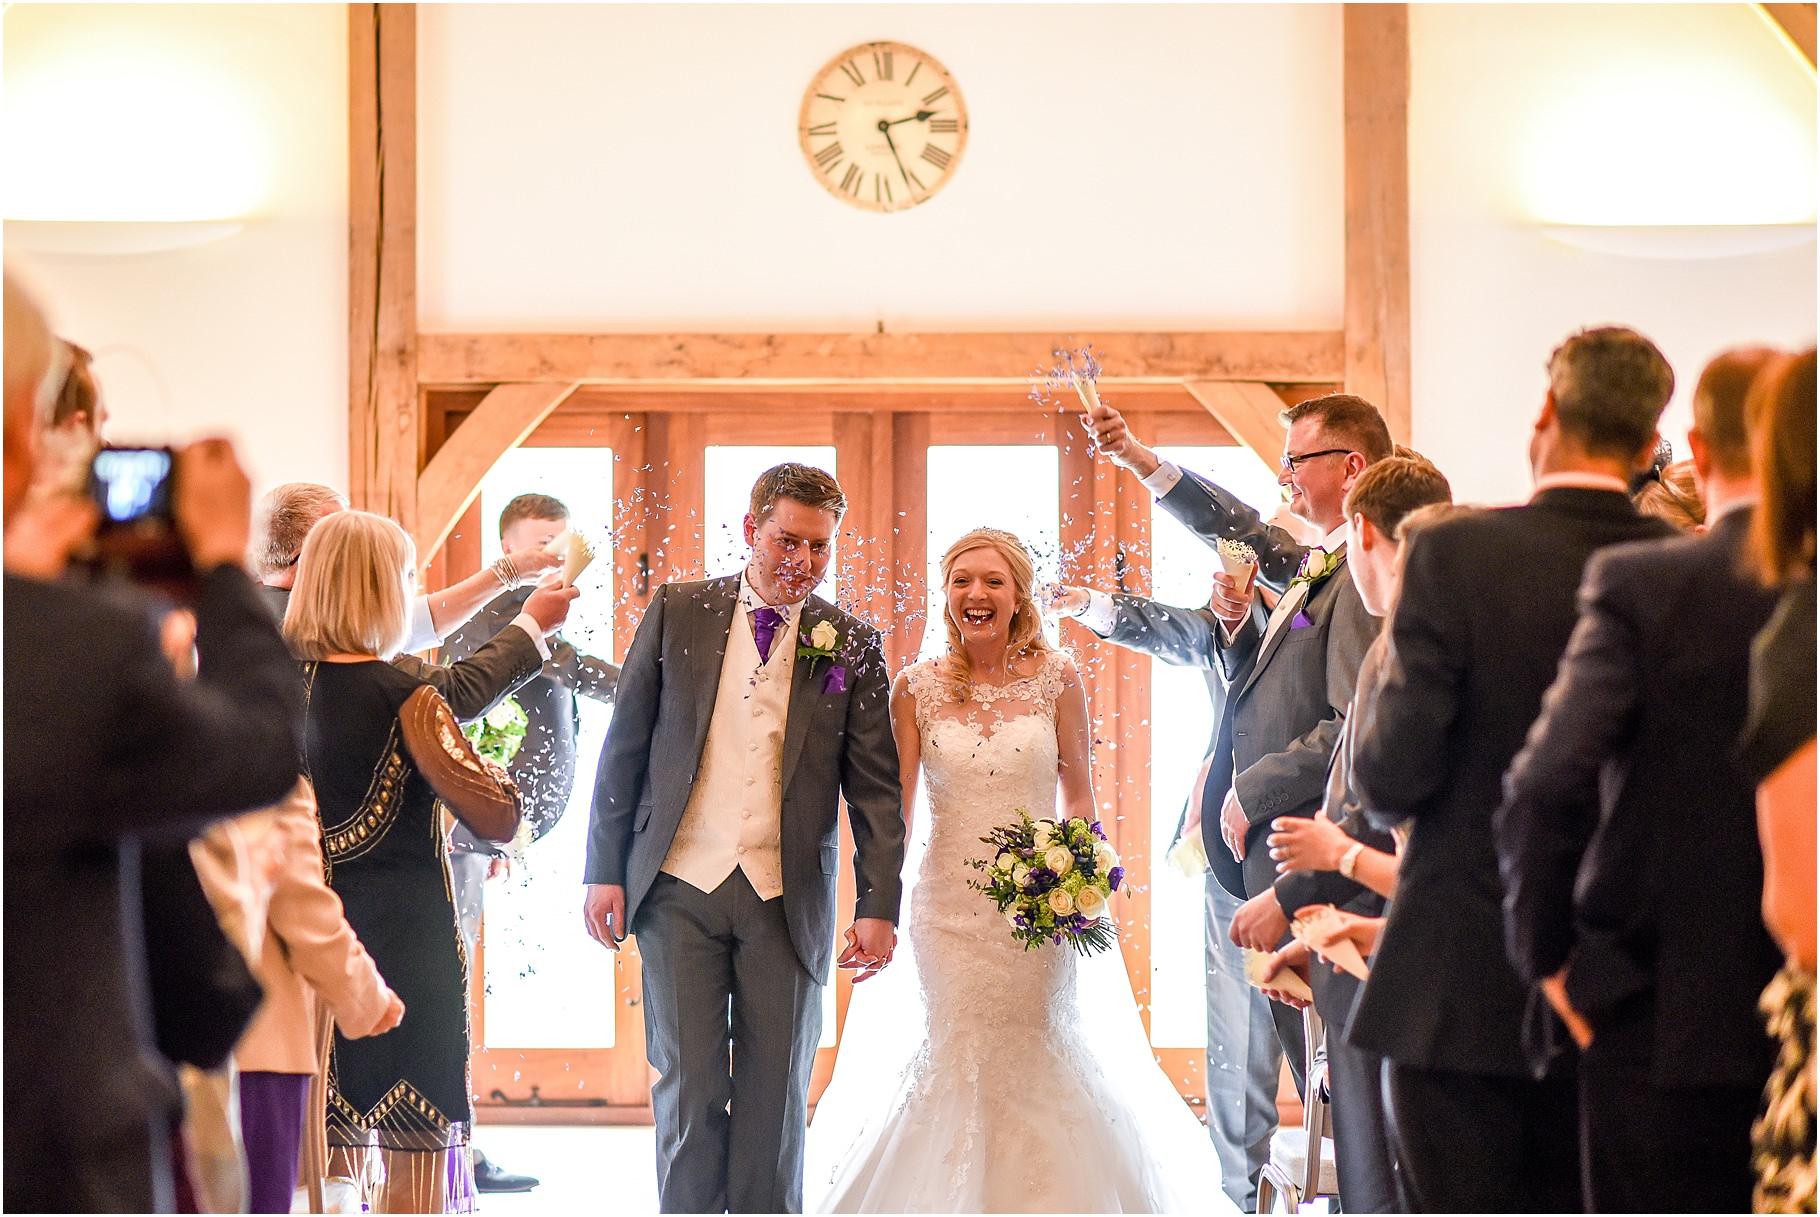 sandhole-oak-barn-wedding-043.jpg